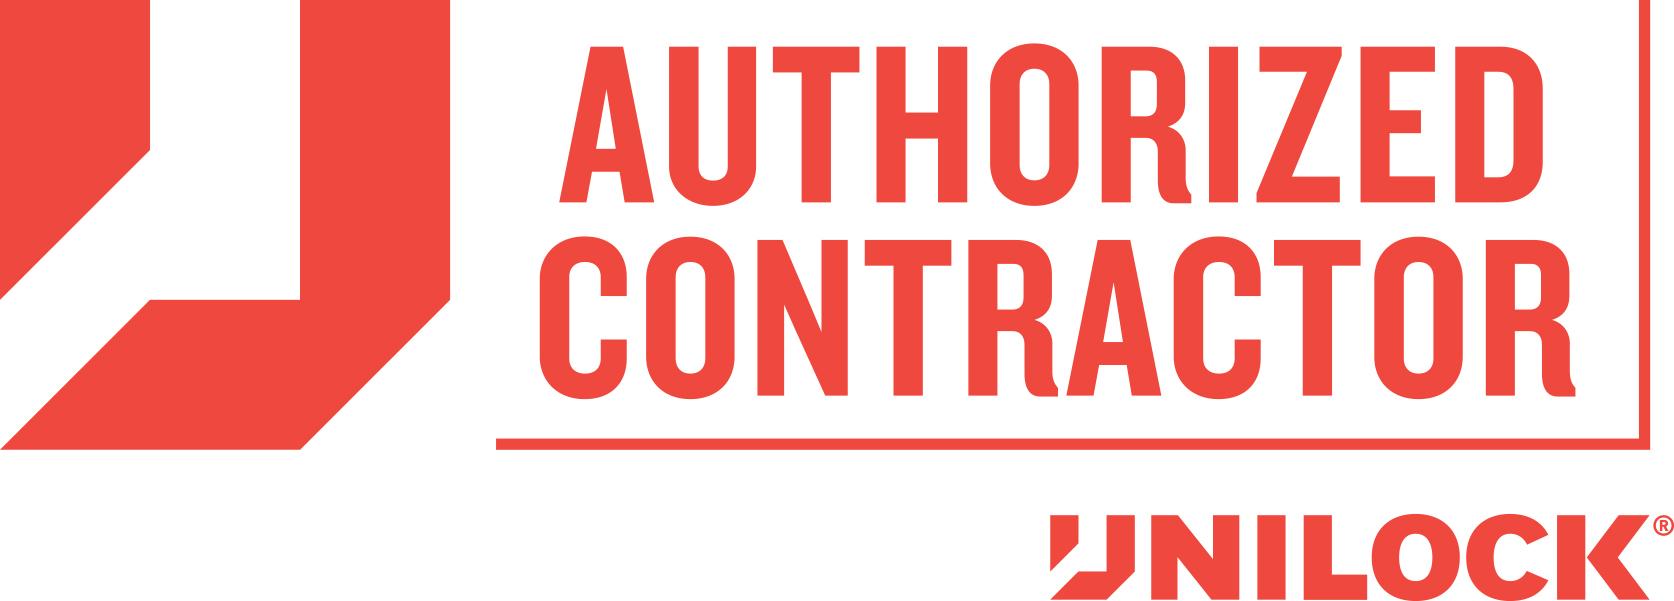 Unilock Authorized hardscape Contractor in Livingston County, MI